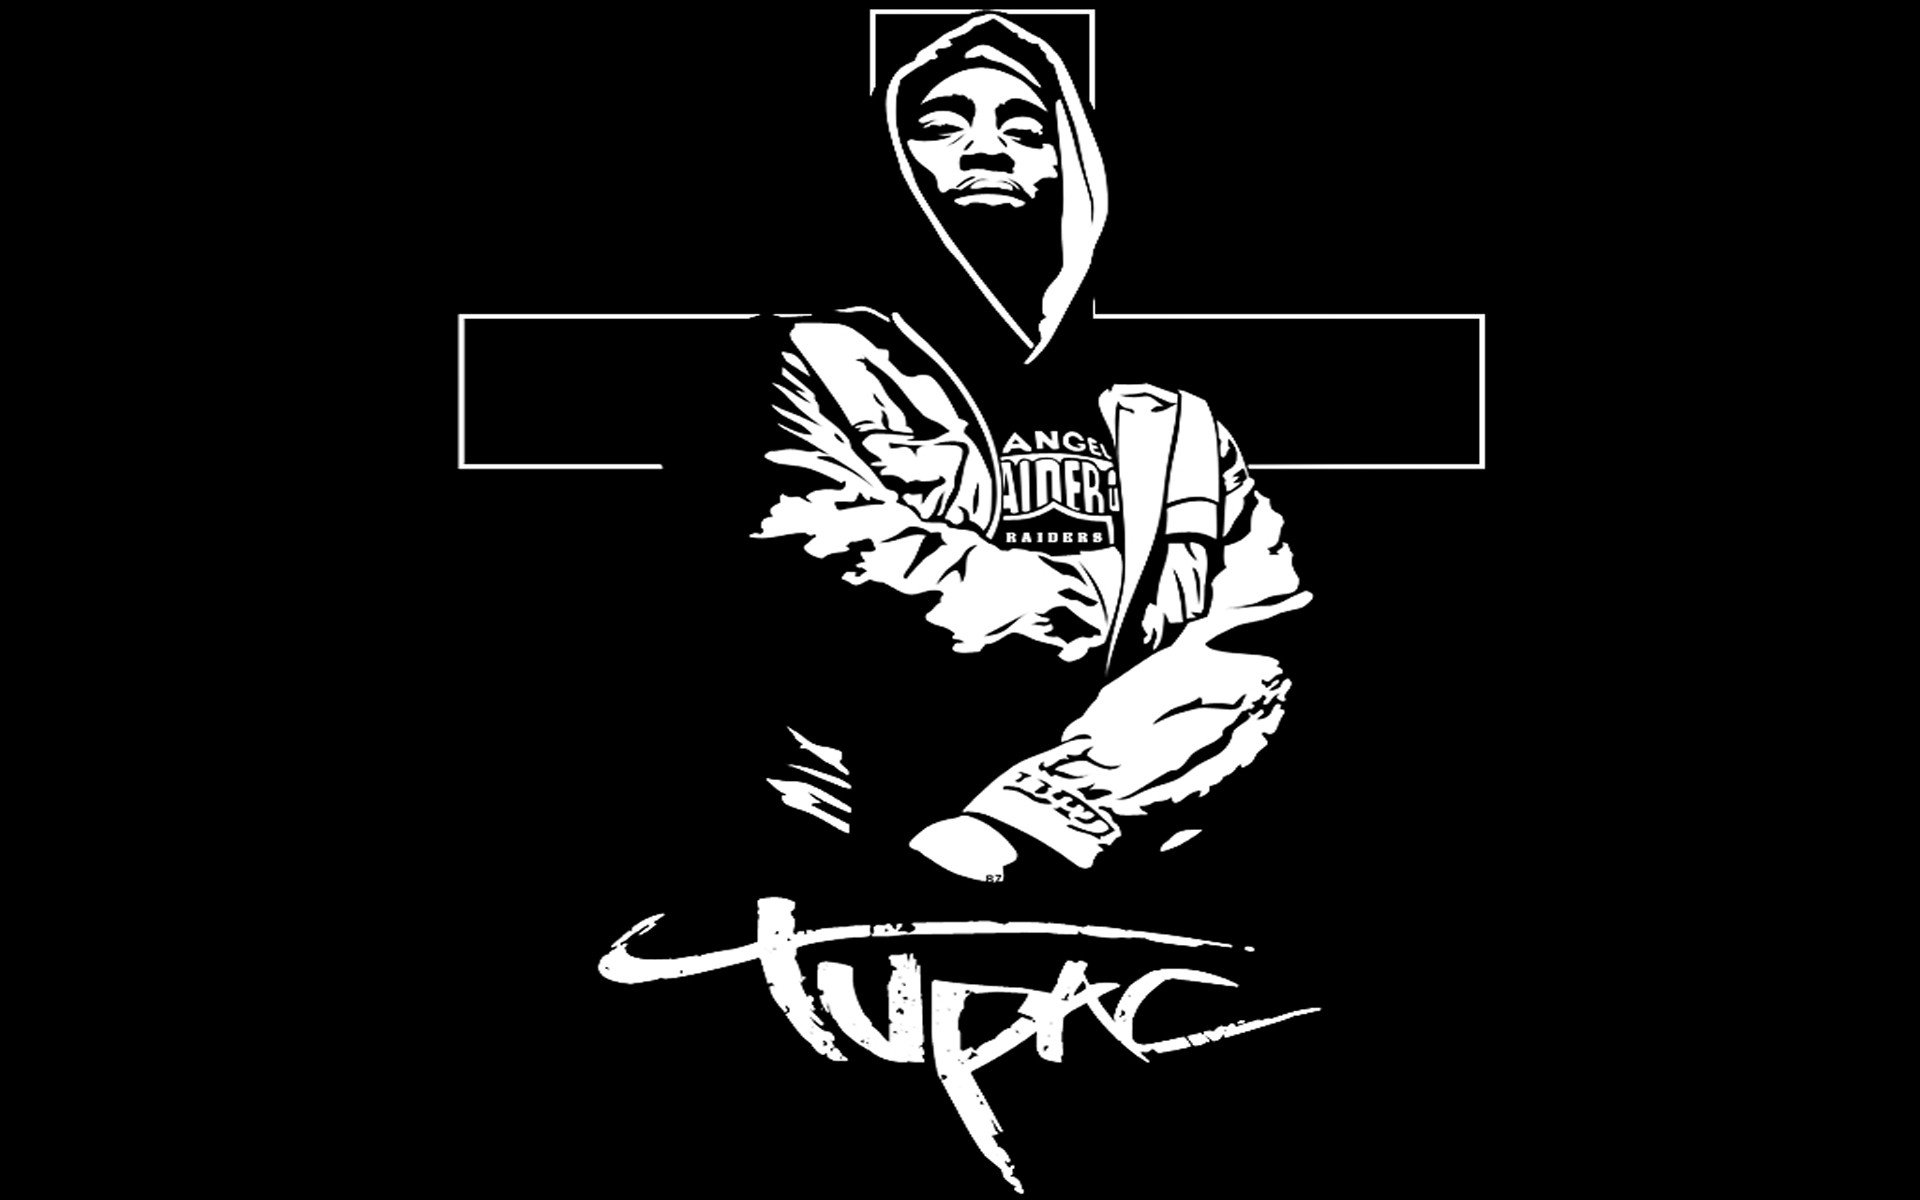 Hip Hop 2pac singers Tupac Shakur rapper artist wallpaper background 1920x1200